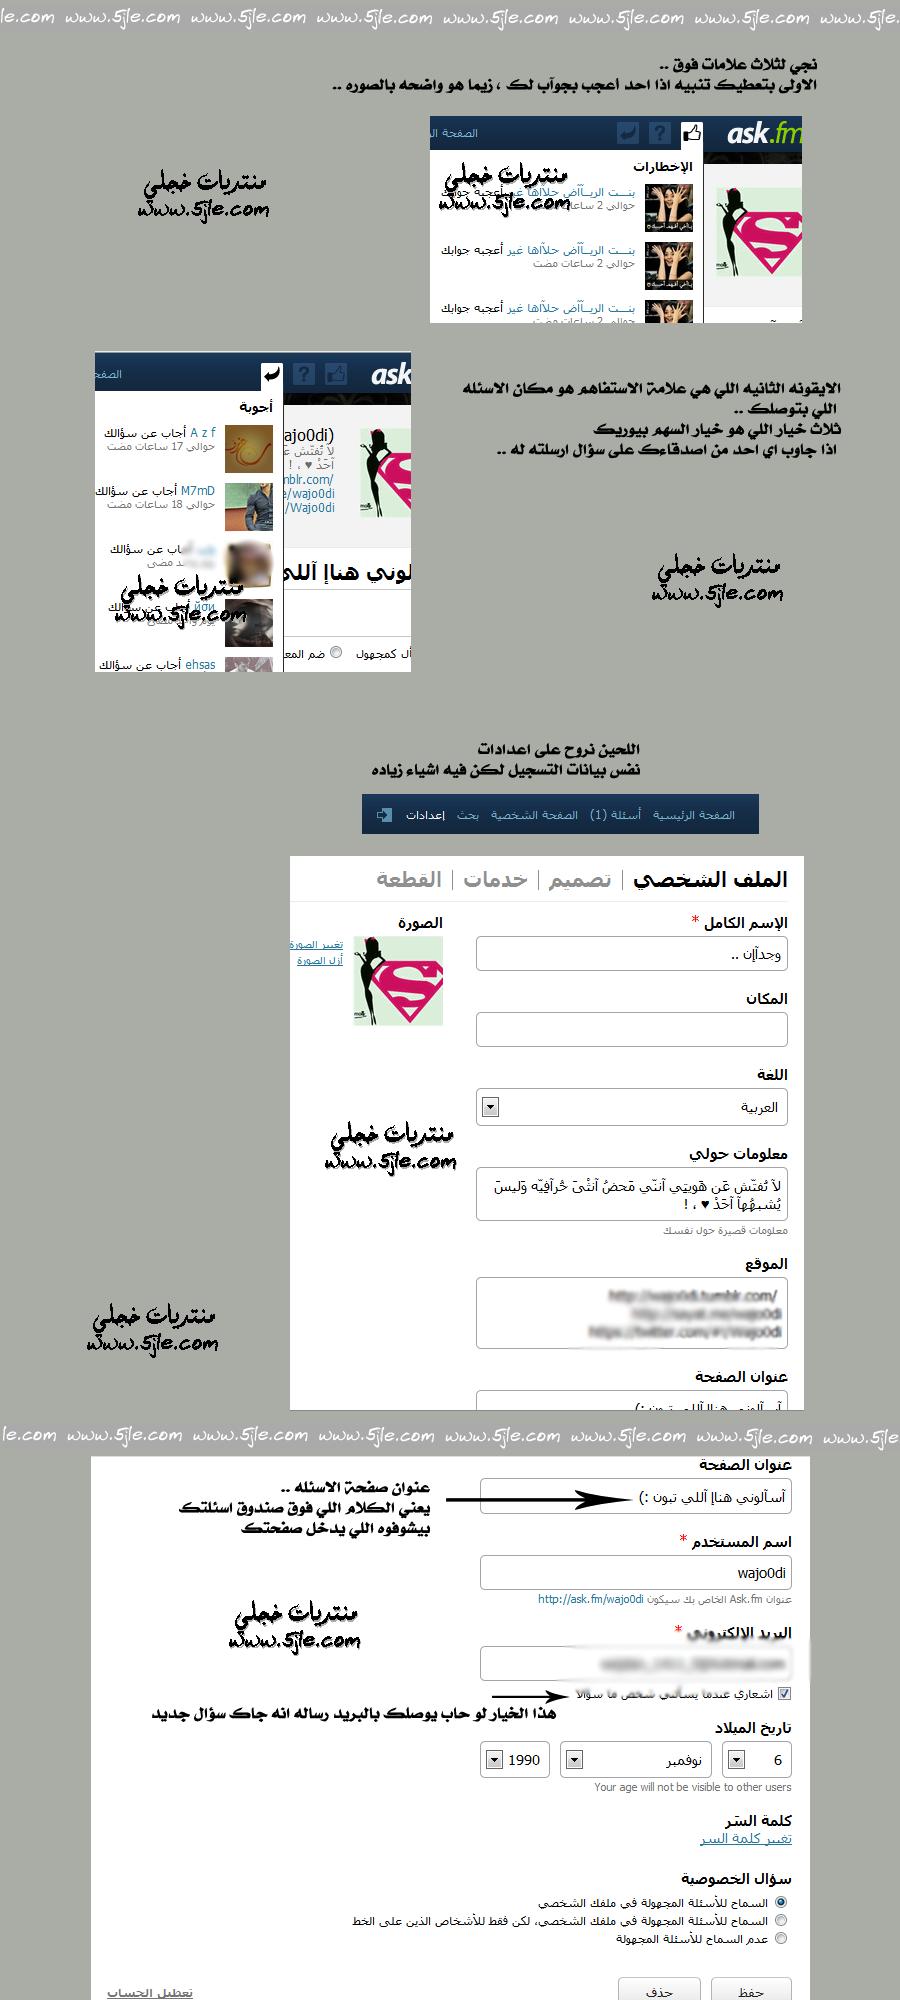 ���� Ask.fm�